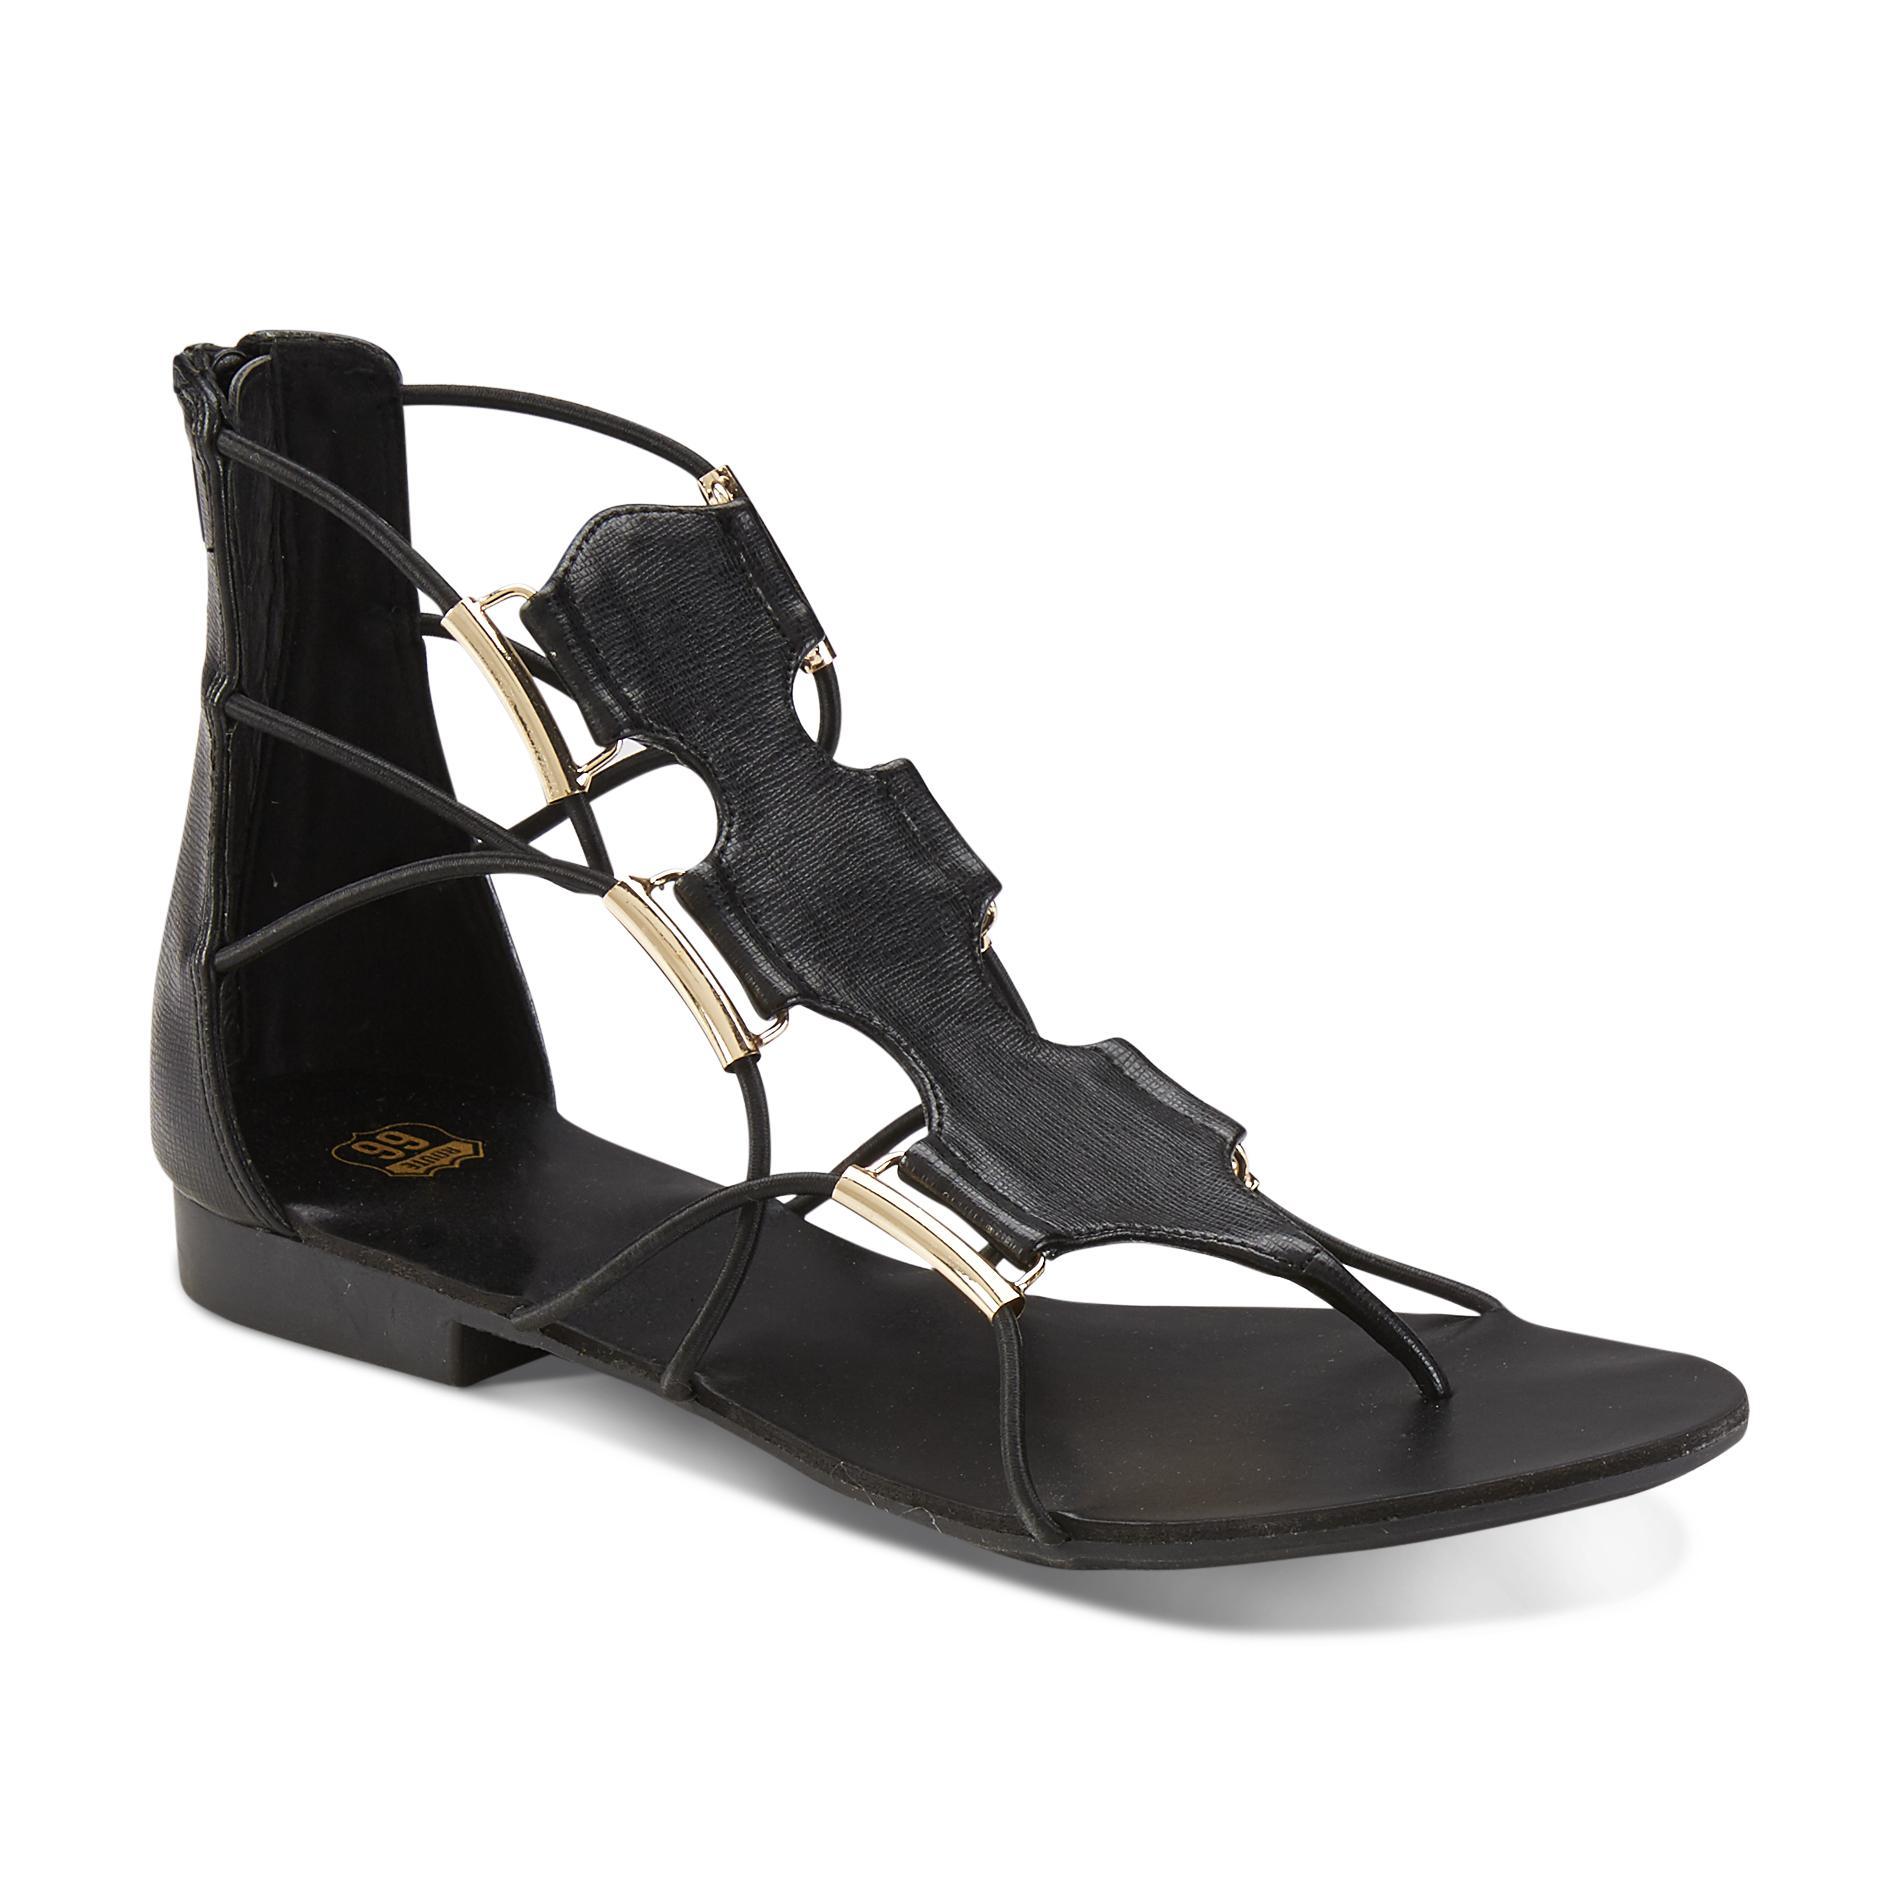 Route 66 Women's Zanya Black Gladiator Sandal